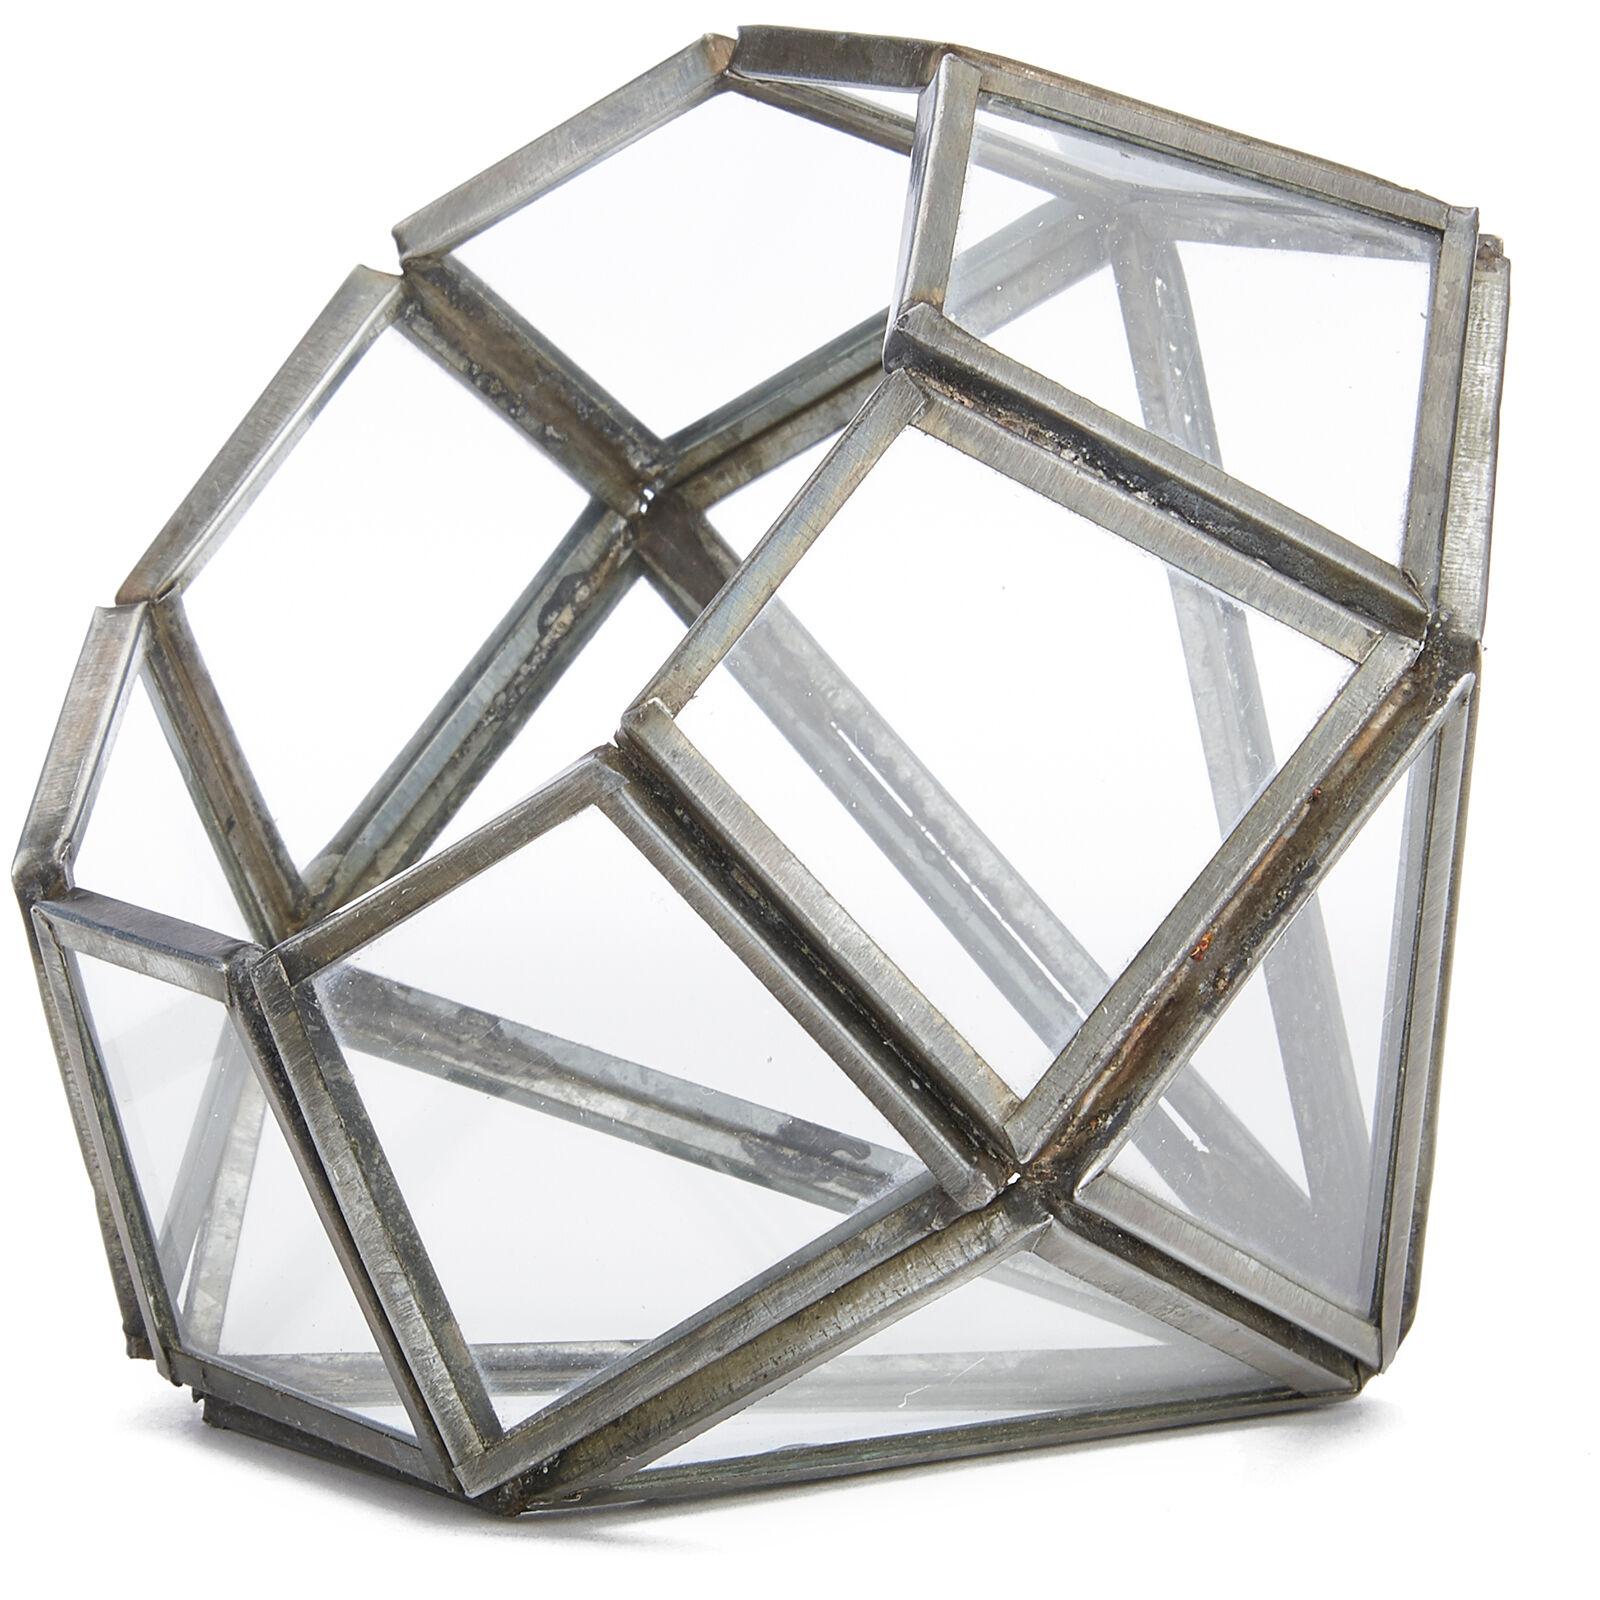 Nkuku Aketa Glass Planter - Antique Zinc - Pointed